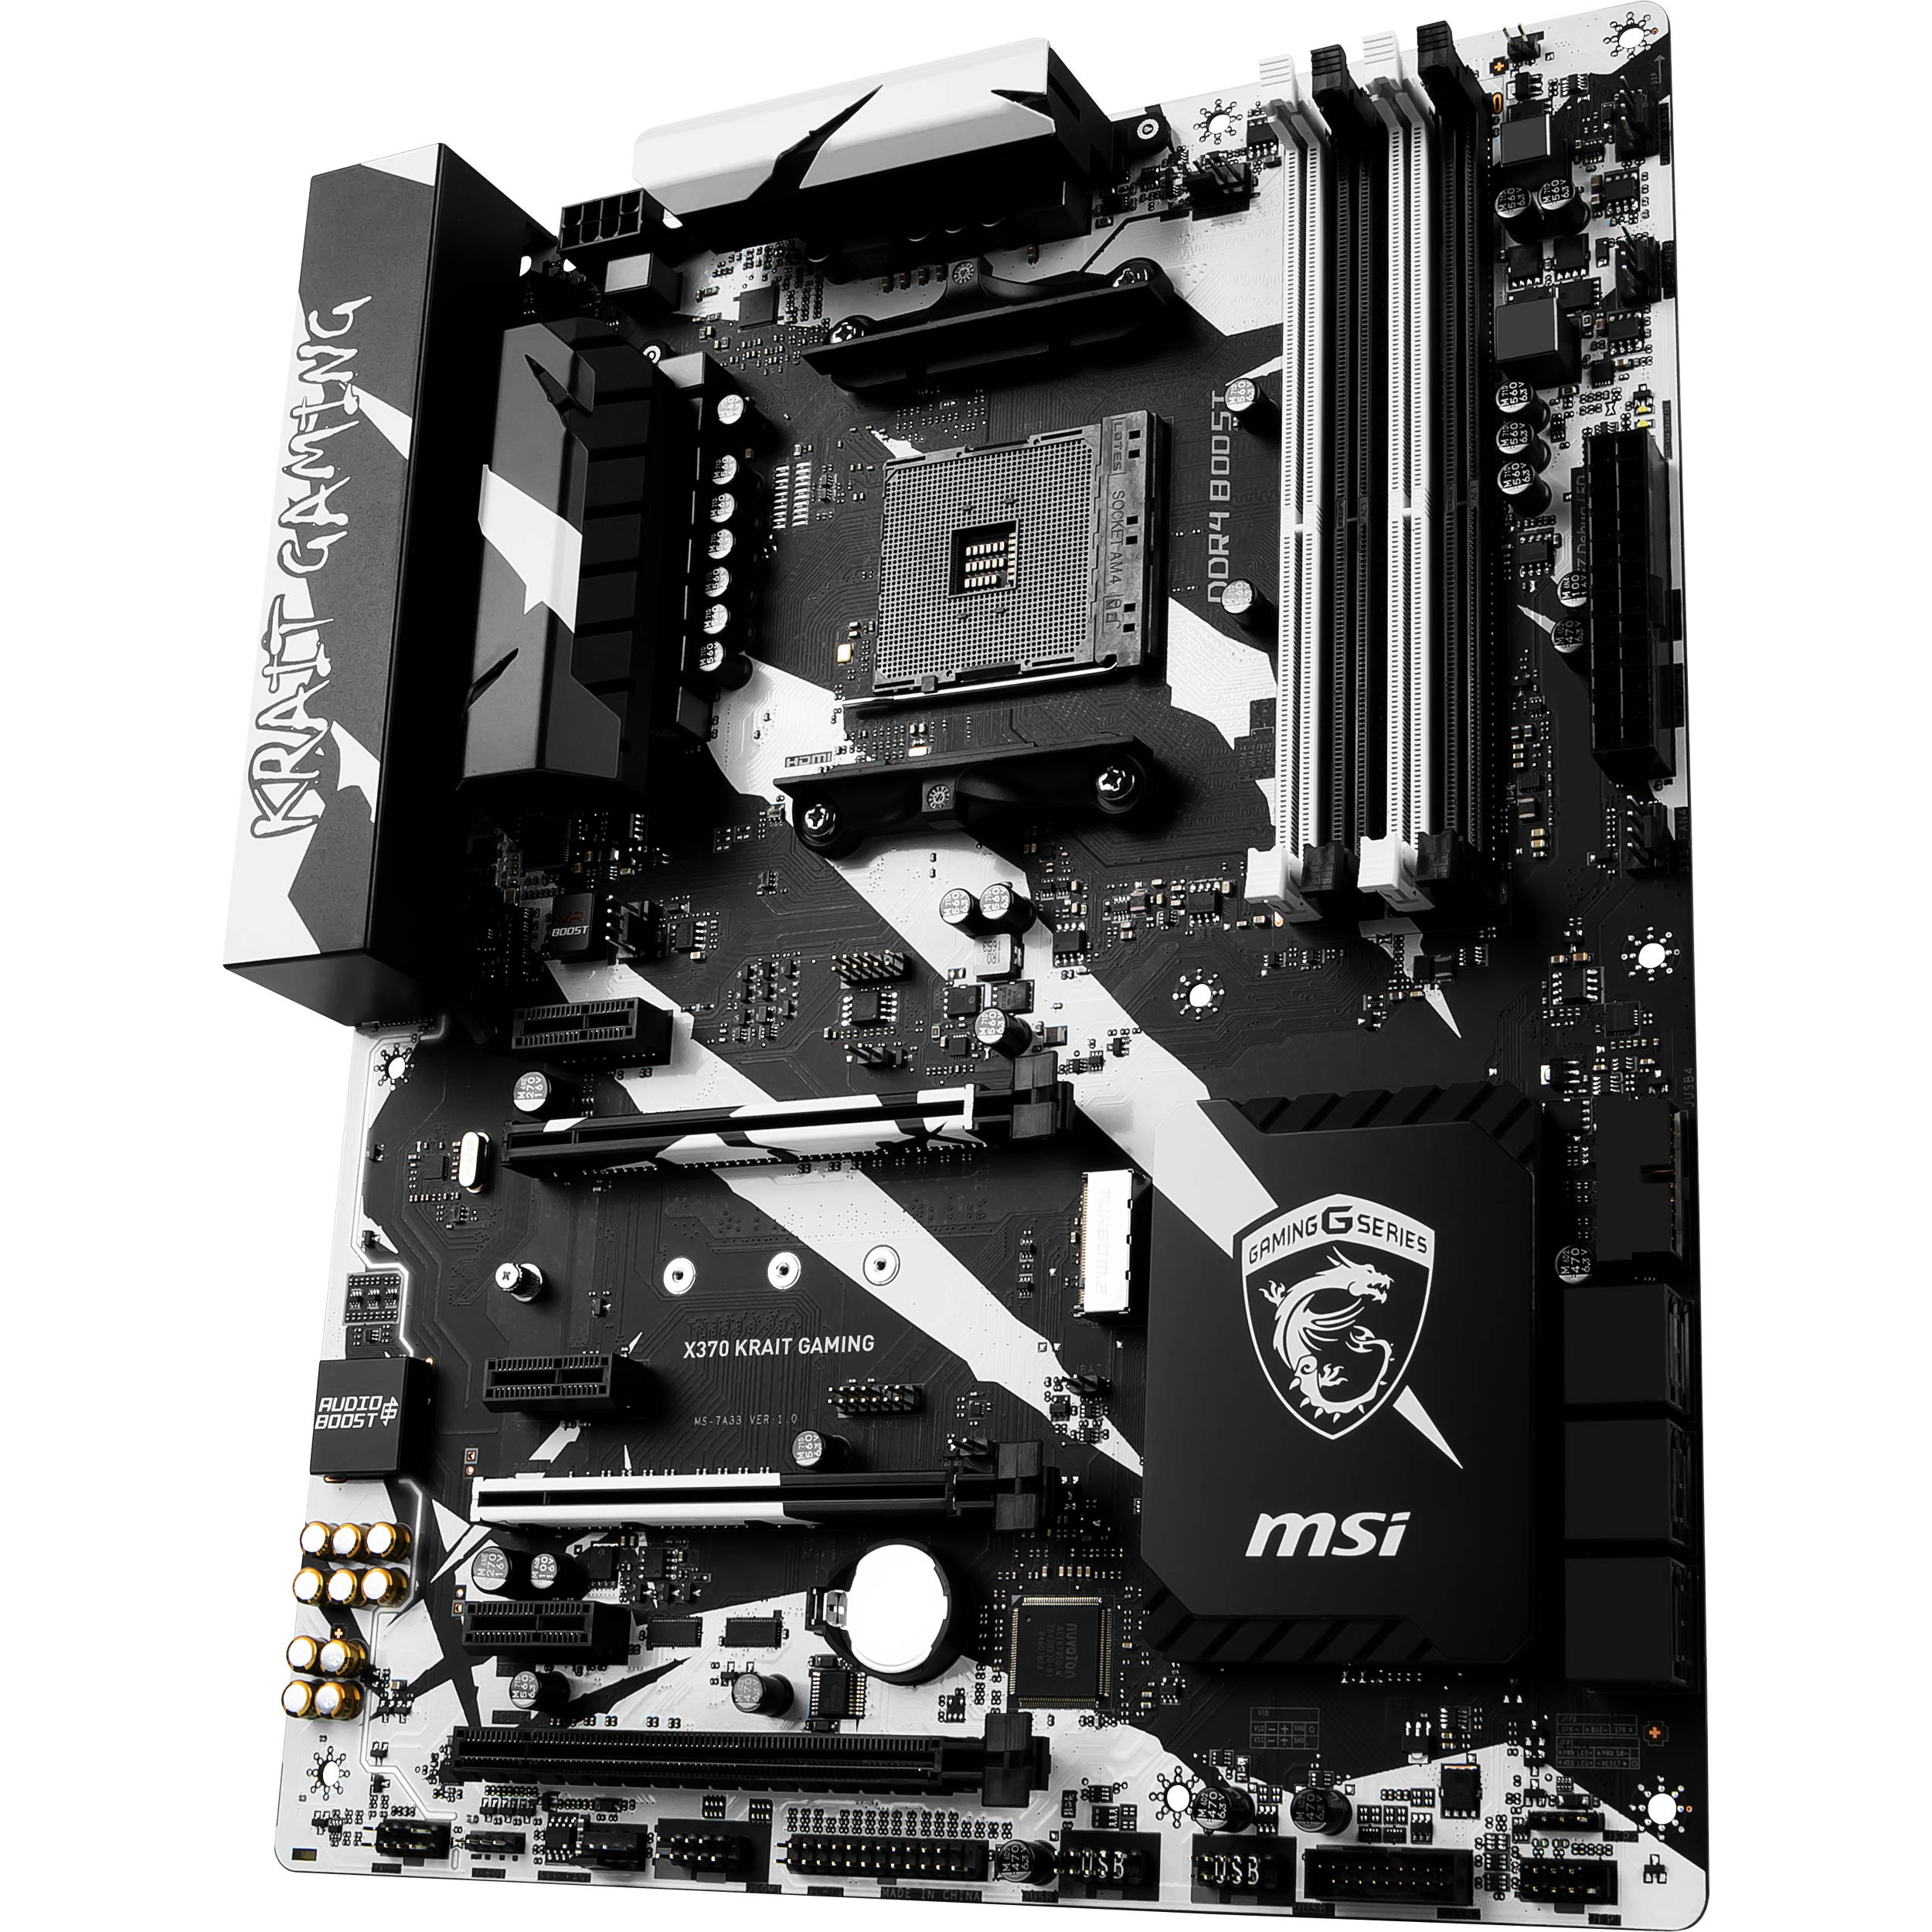 MSI X370 Krait Gaming AM4 ATX Motherboard